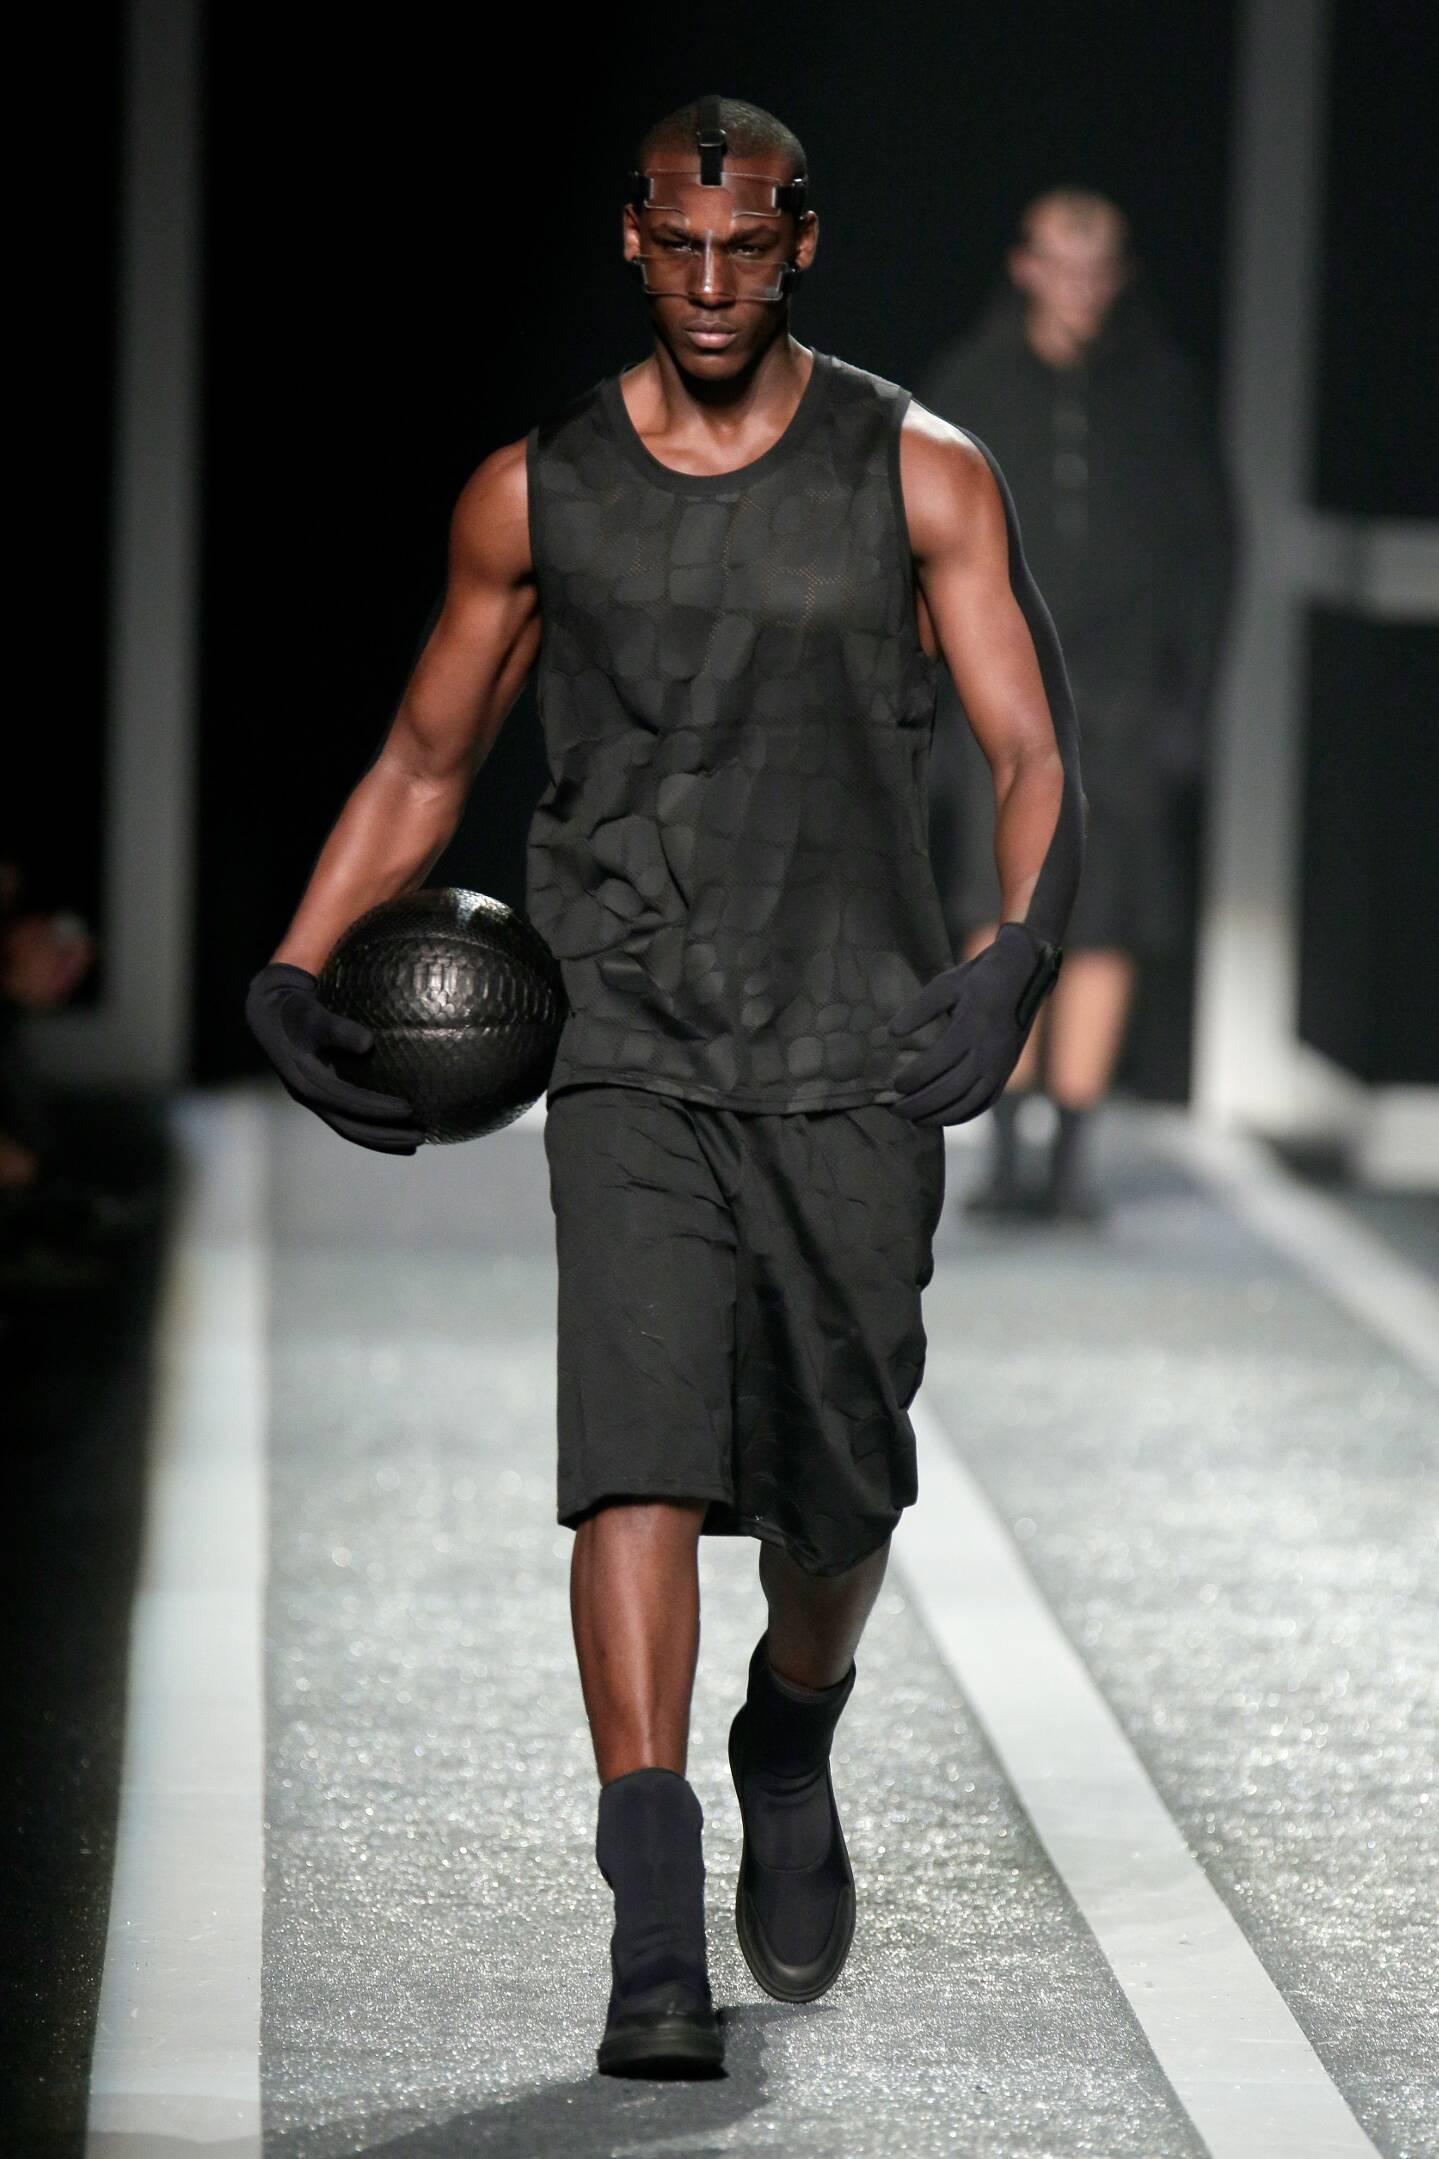 2015 Alexander Wang for H&M Man Model